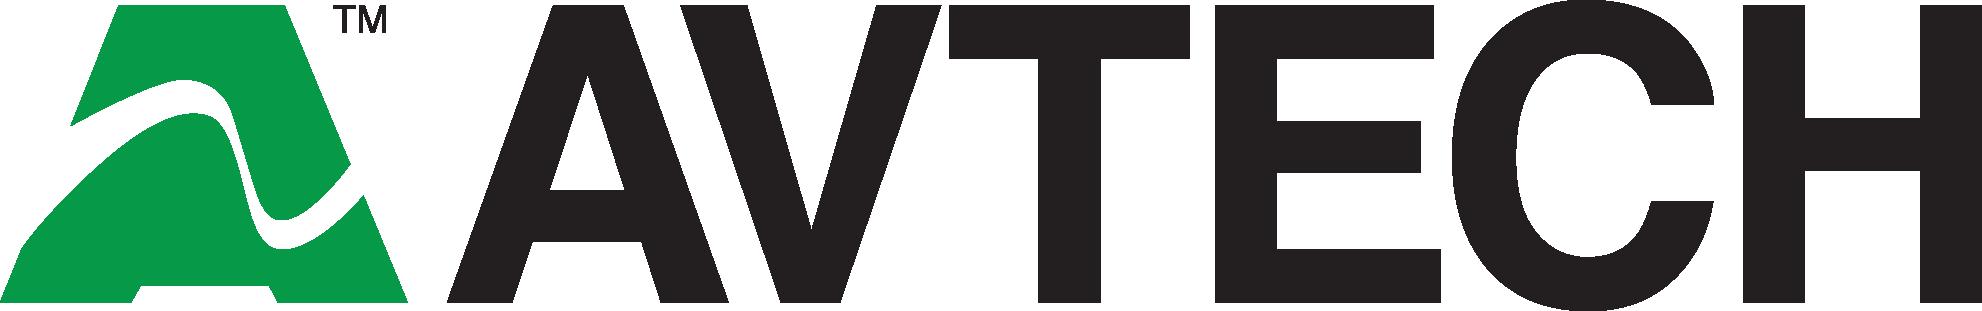 avtech-name-logo-color